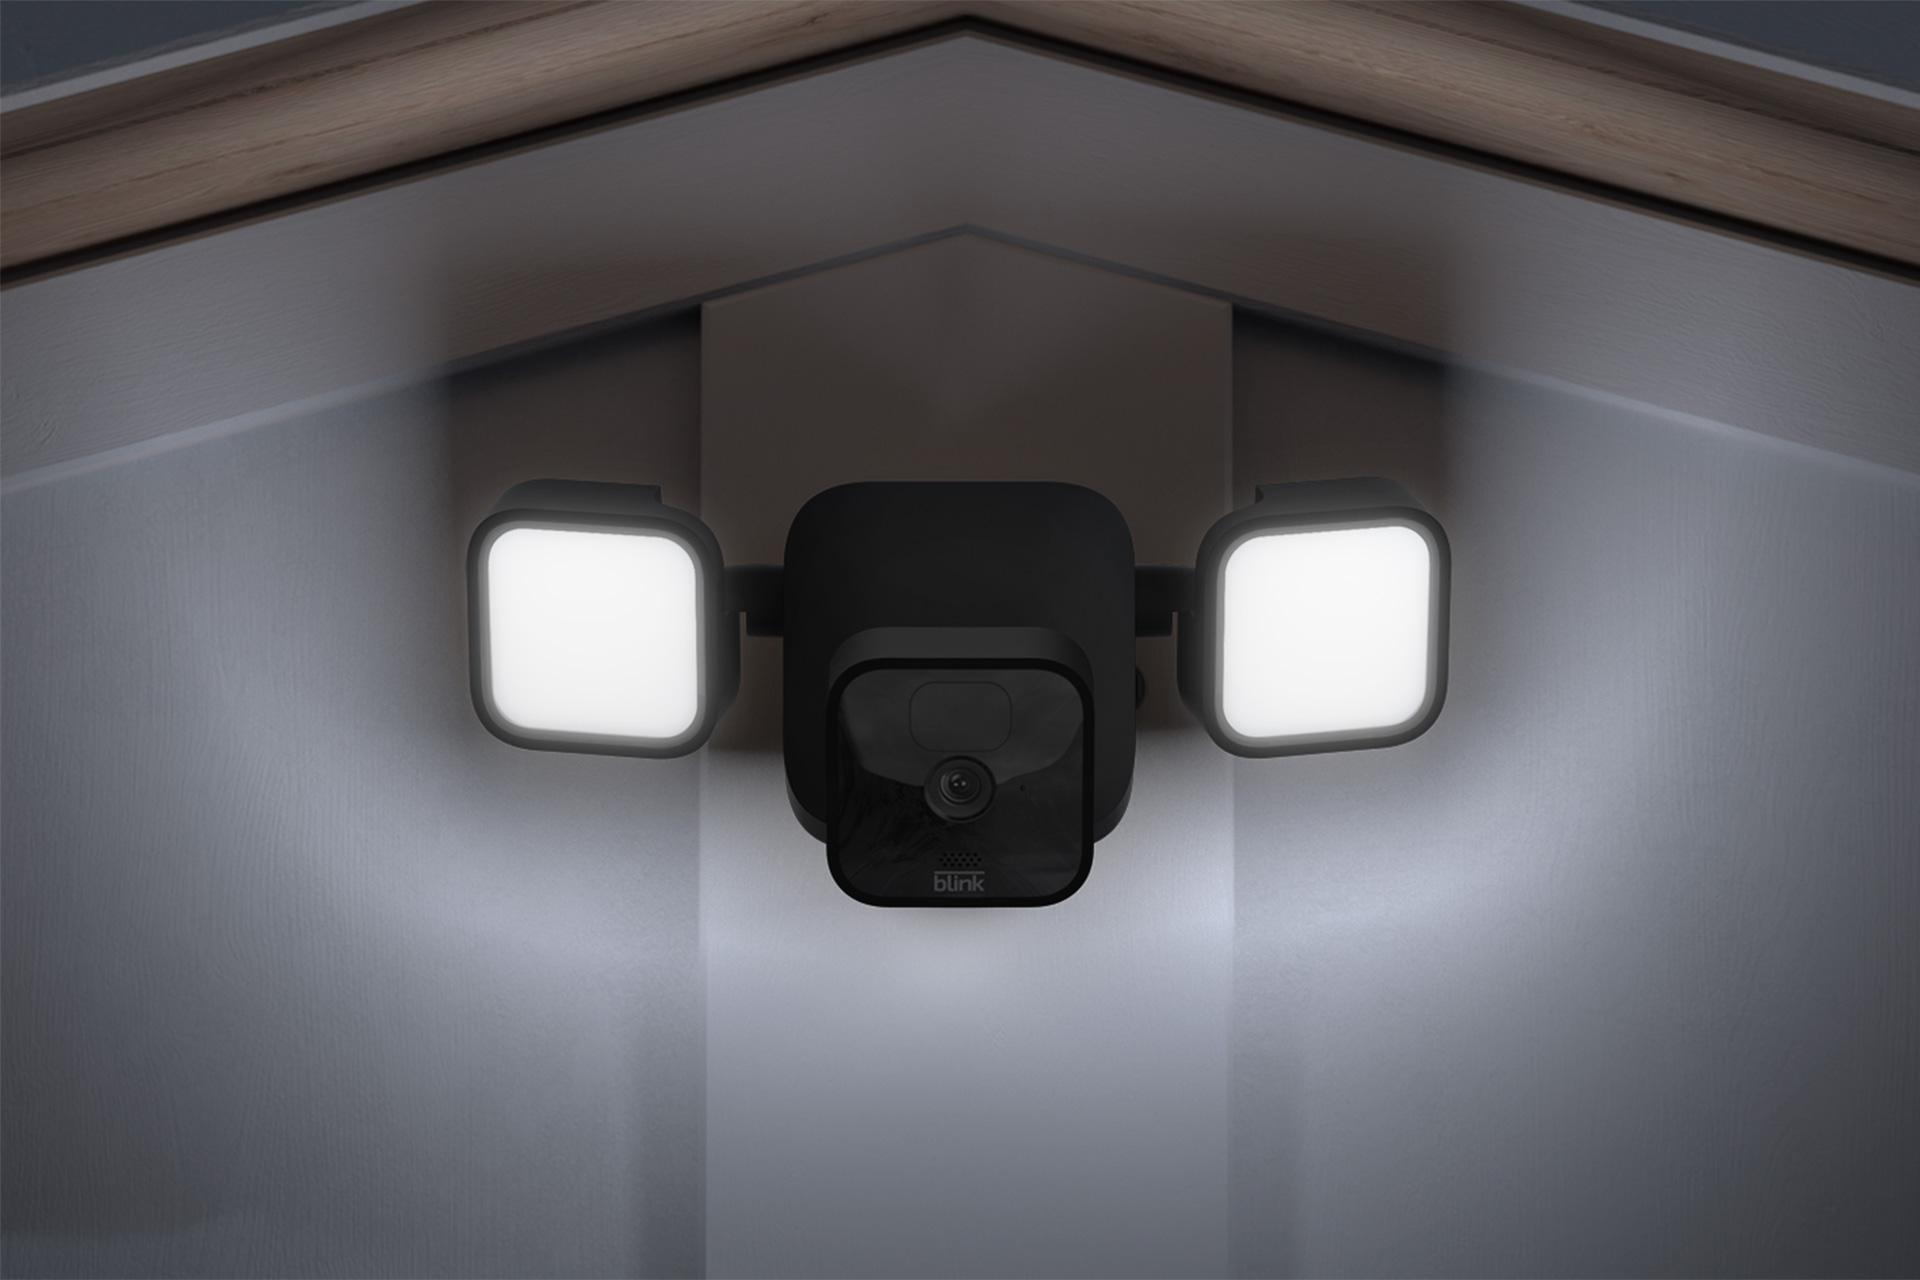 Amazon Blink Floodlight Camera Mount